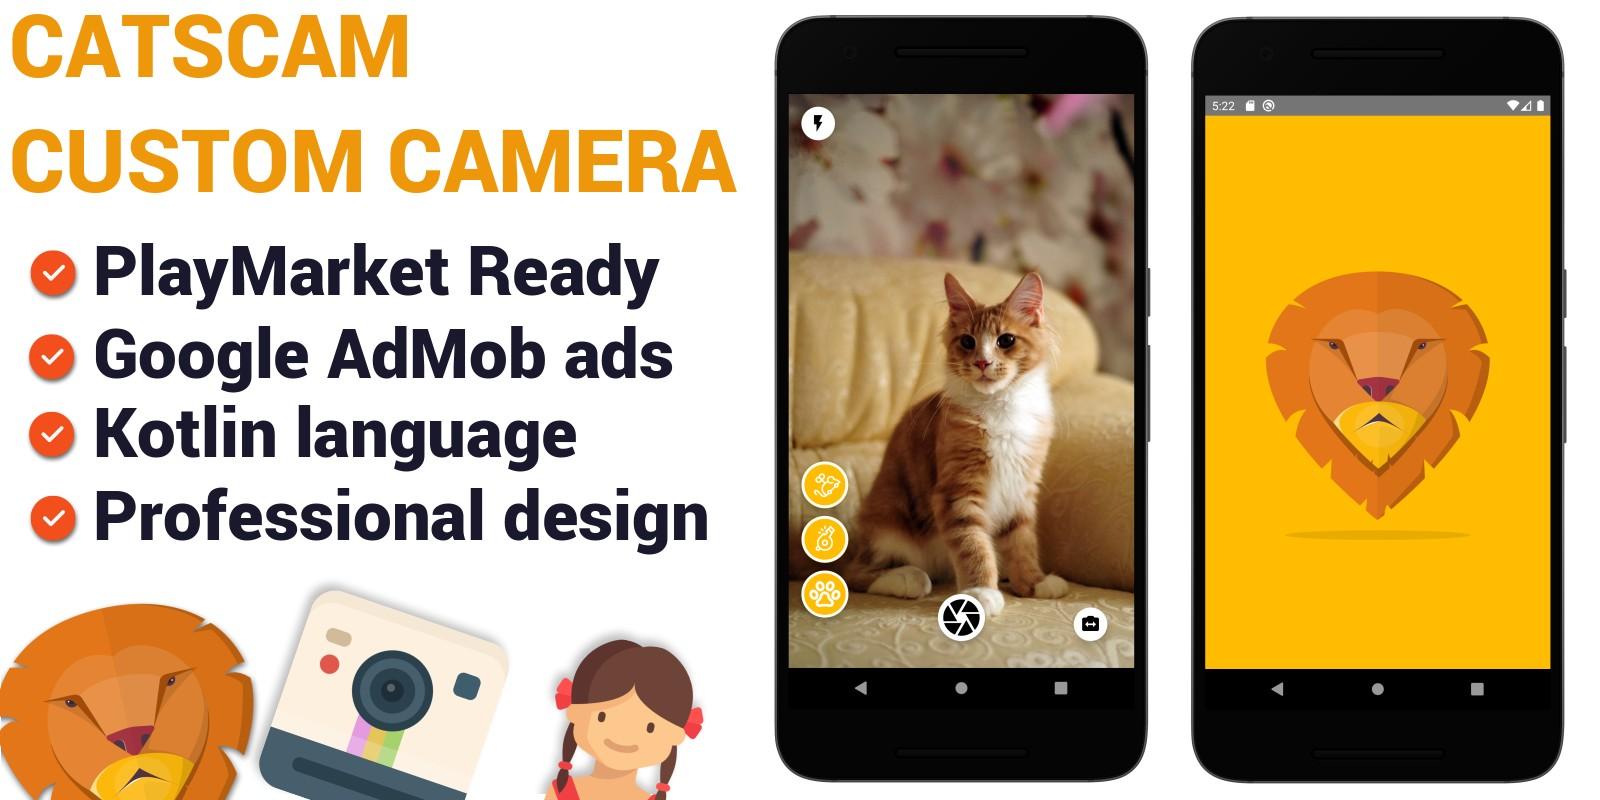 CatsCam - Android Custom Camera Source Code